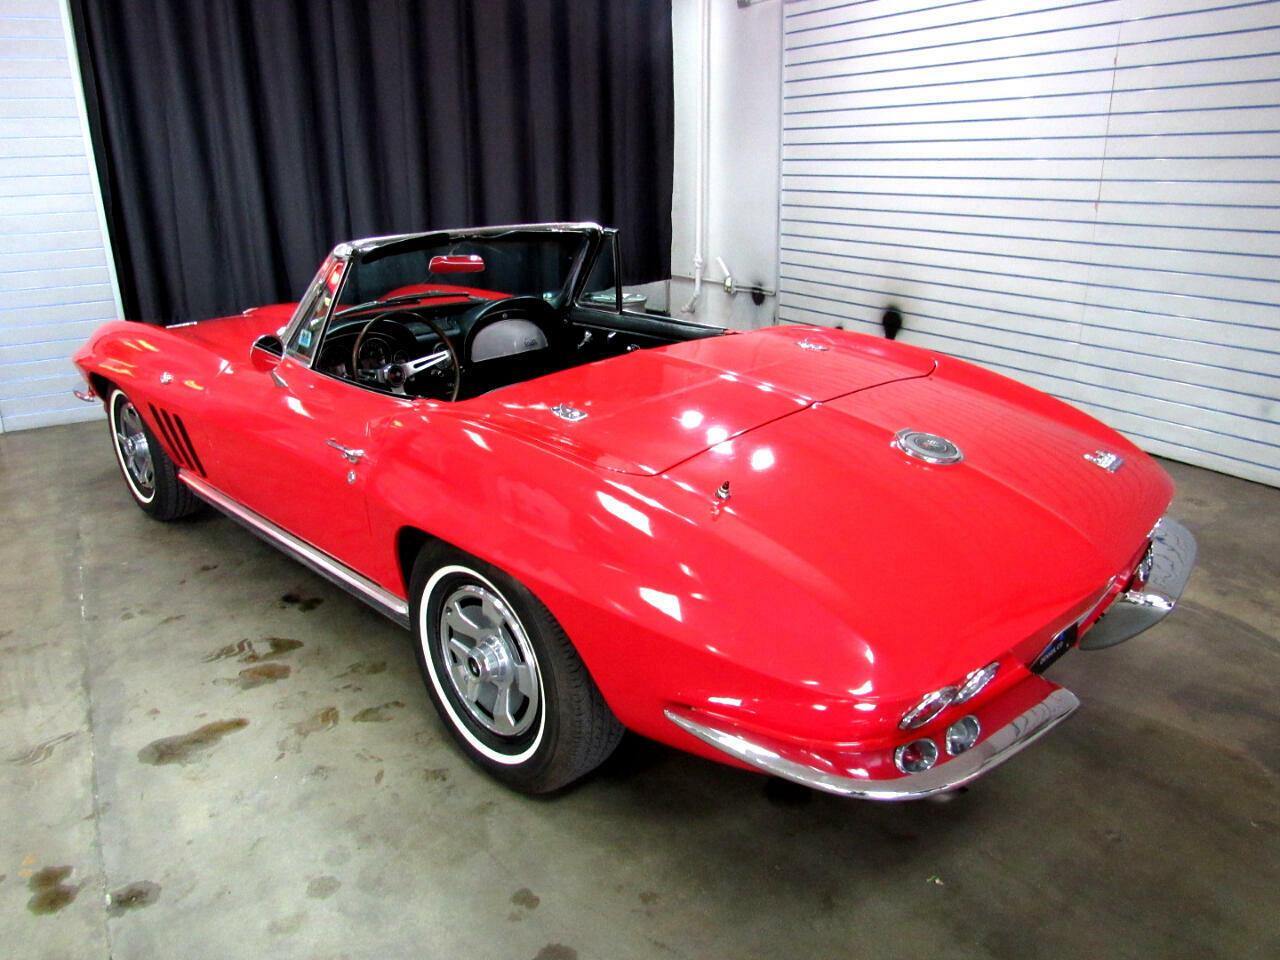 1966 Red Chevrolet Corvette Convertible    C2 Corvette Photo 4